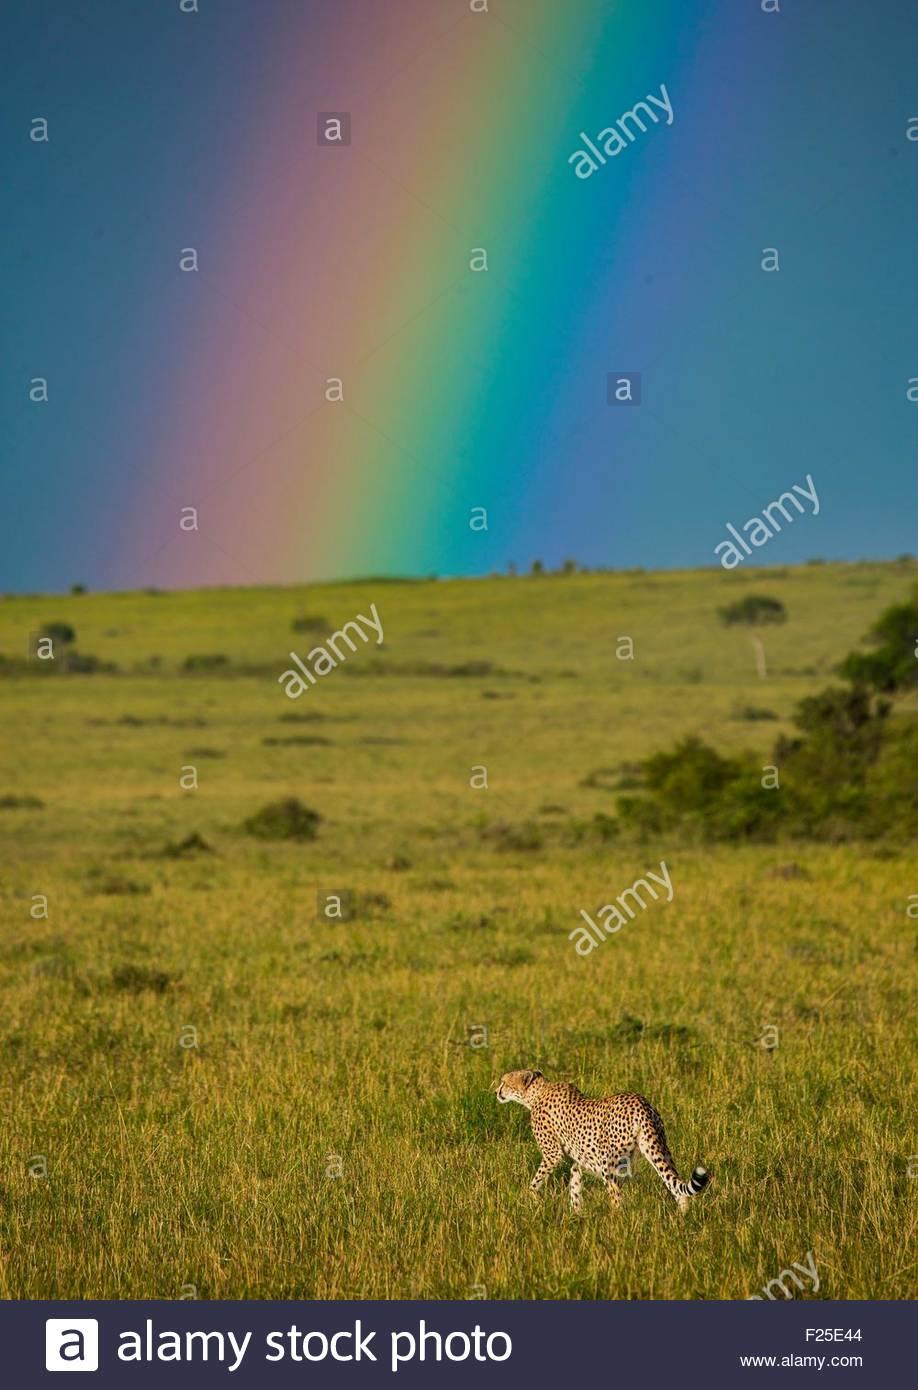 Kenya, Rift Valley Province, Maasai Mara, cheetah (acinonyx jubatus) in front of a rainbow - Stock Image